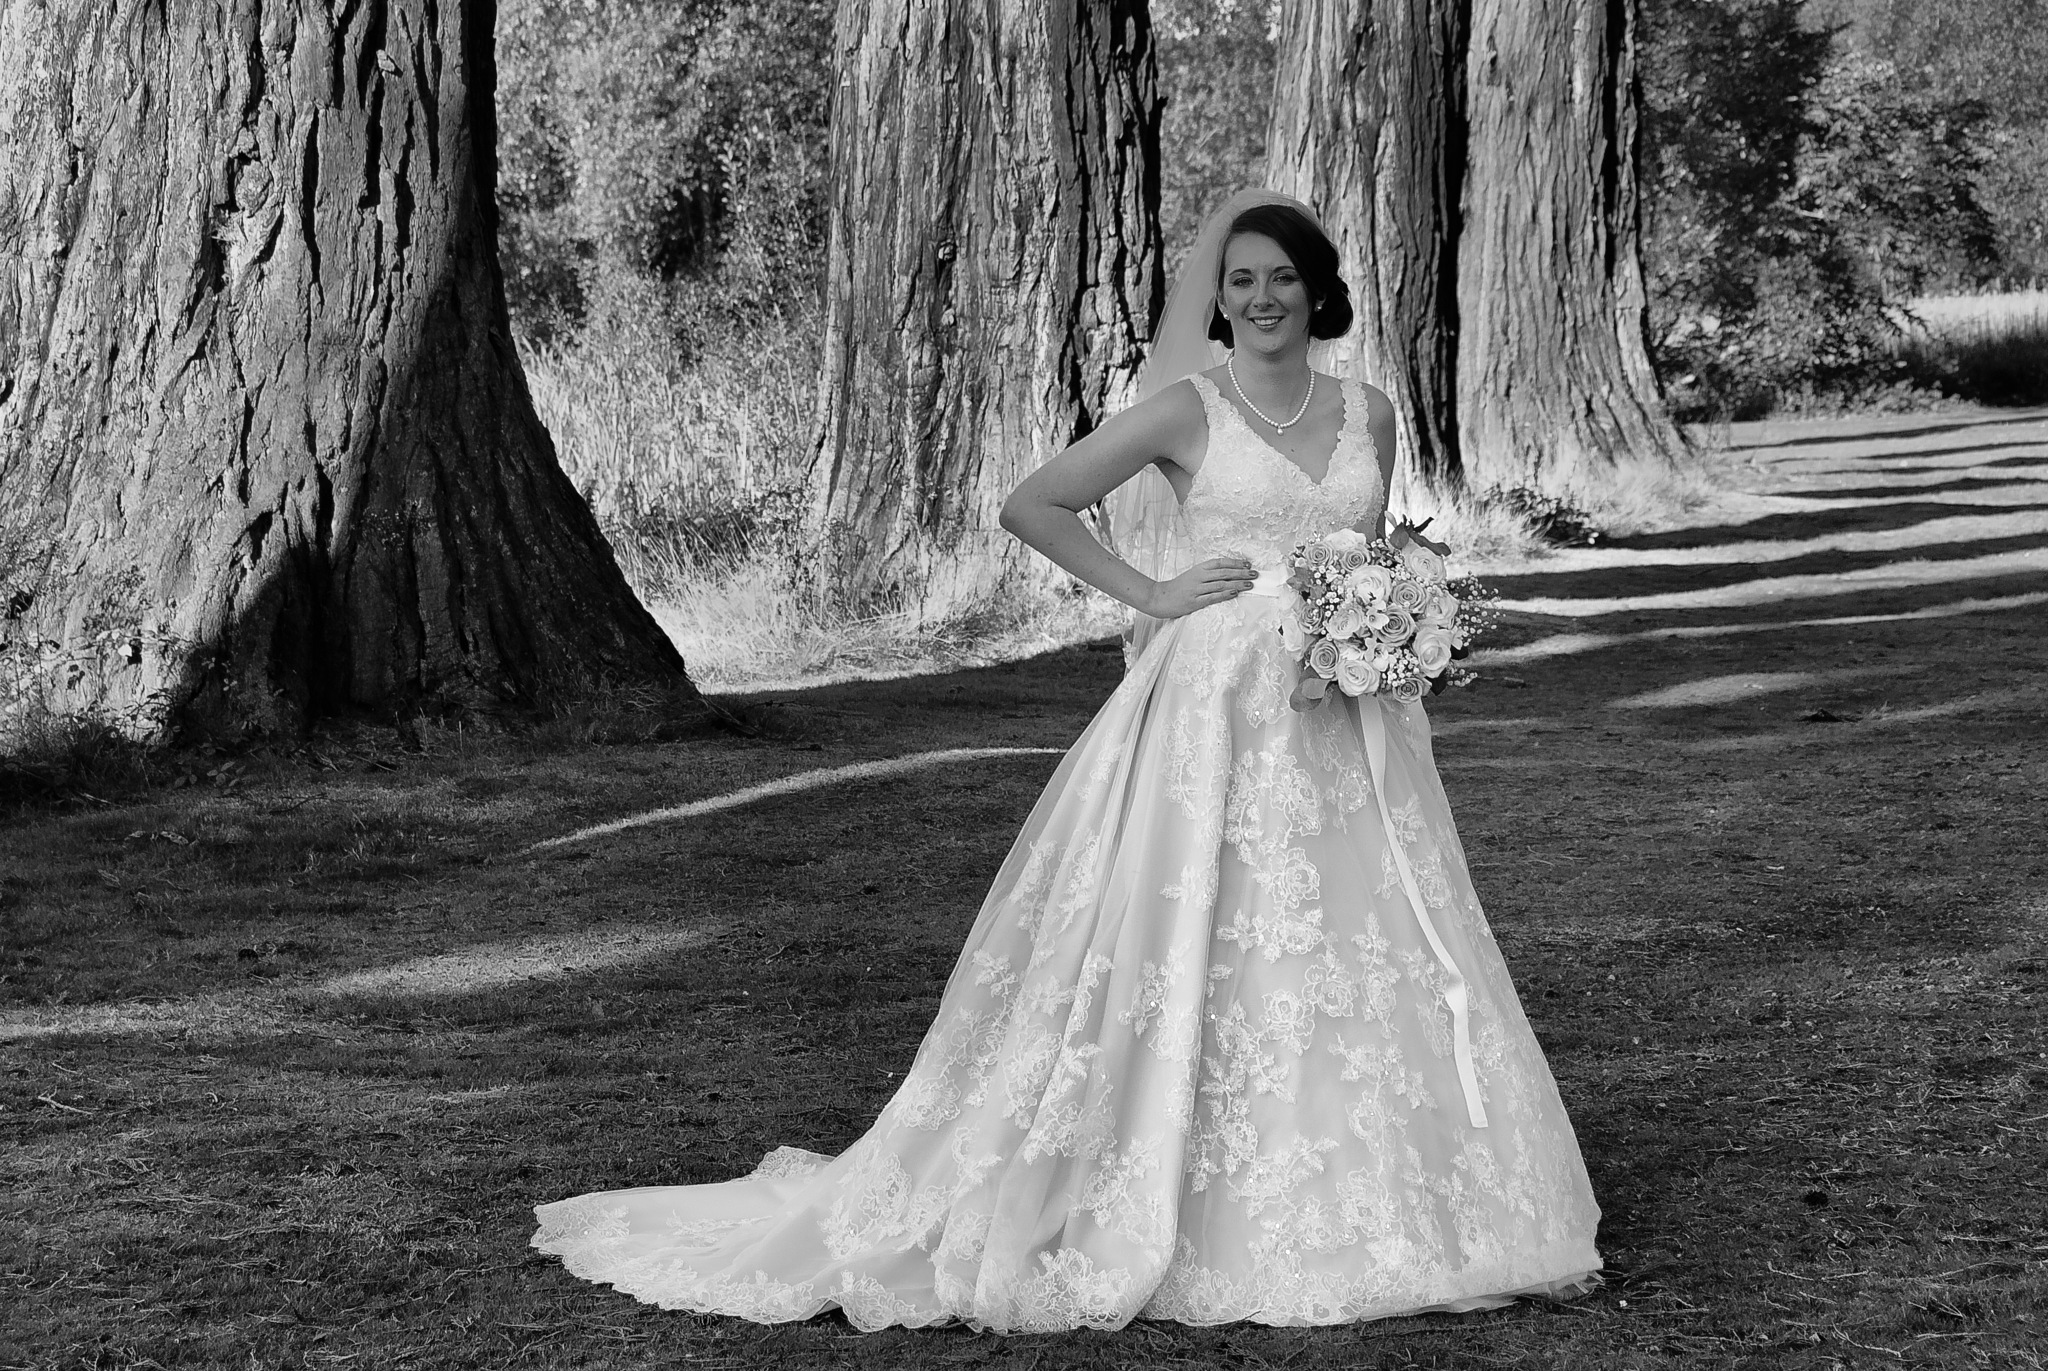 Wedding Dress by Ian Scrimgeour